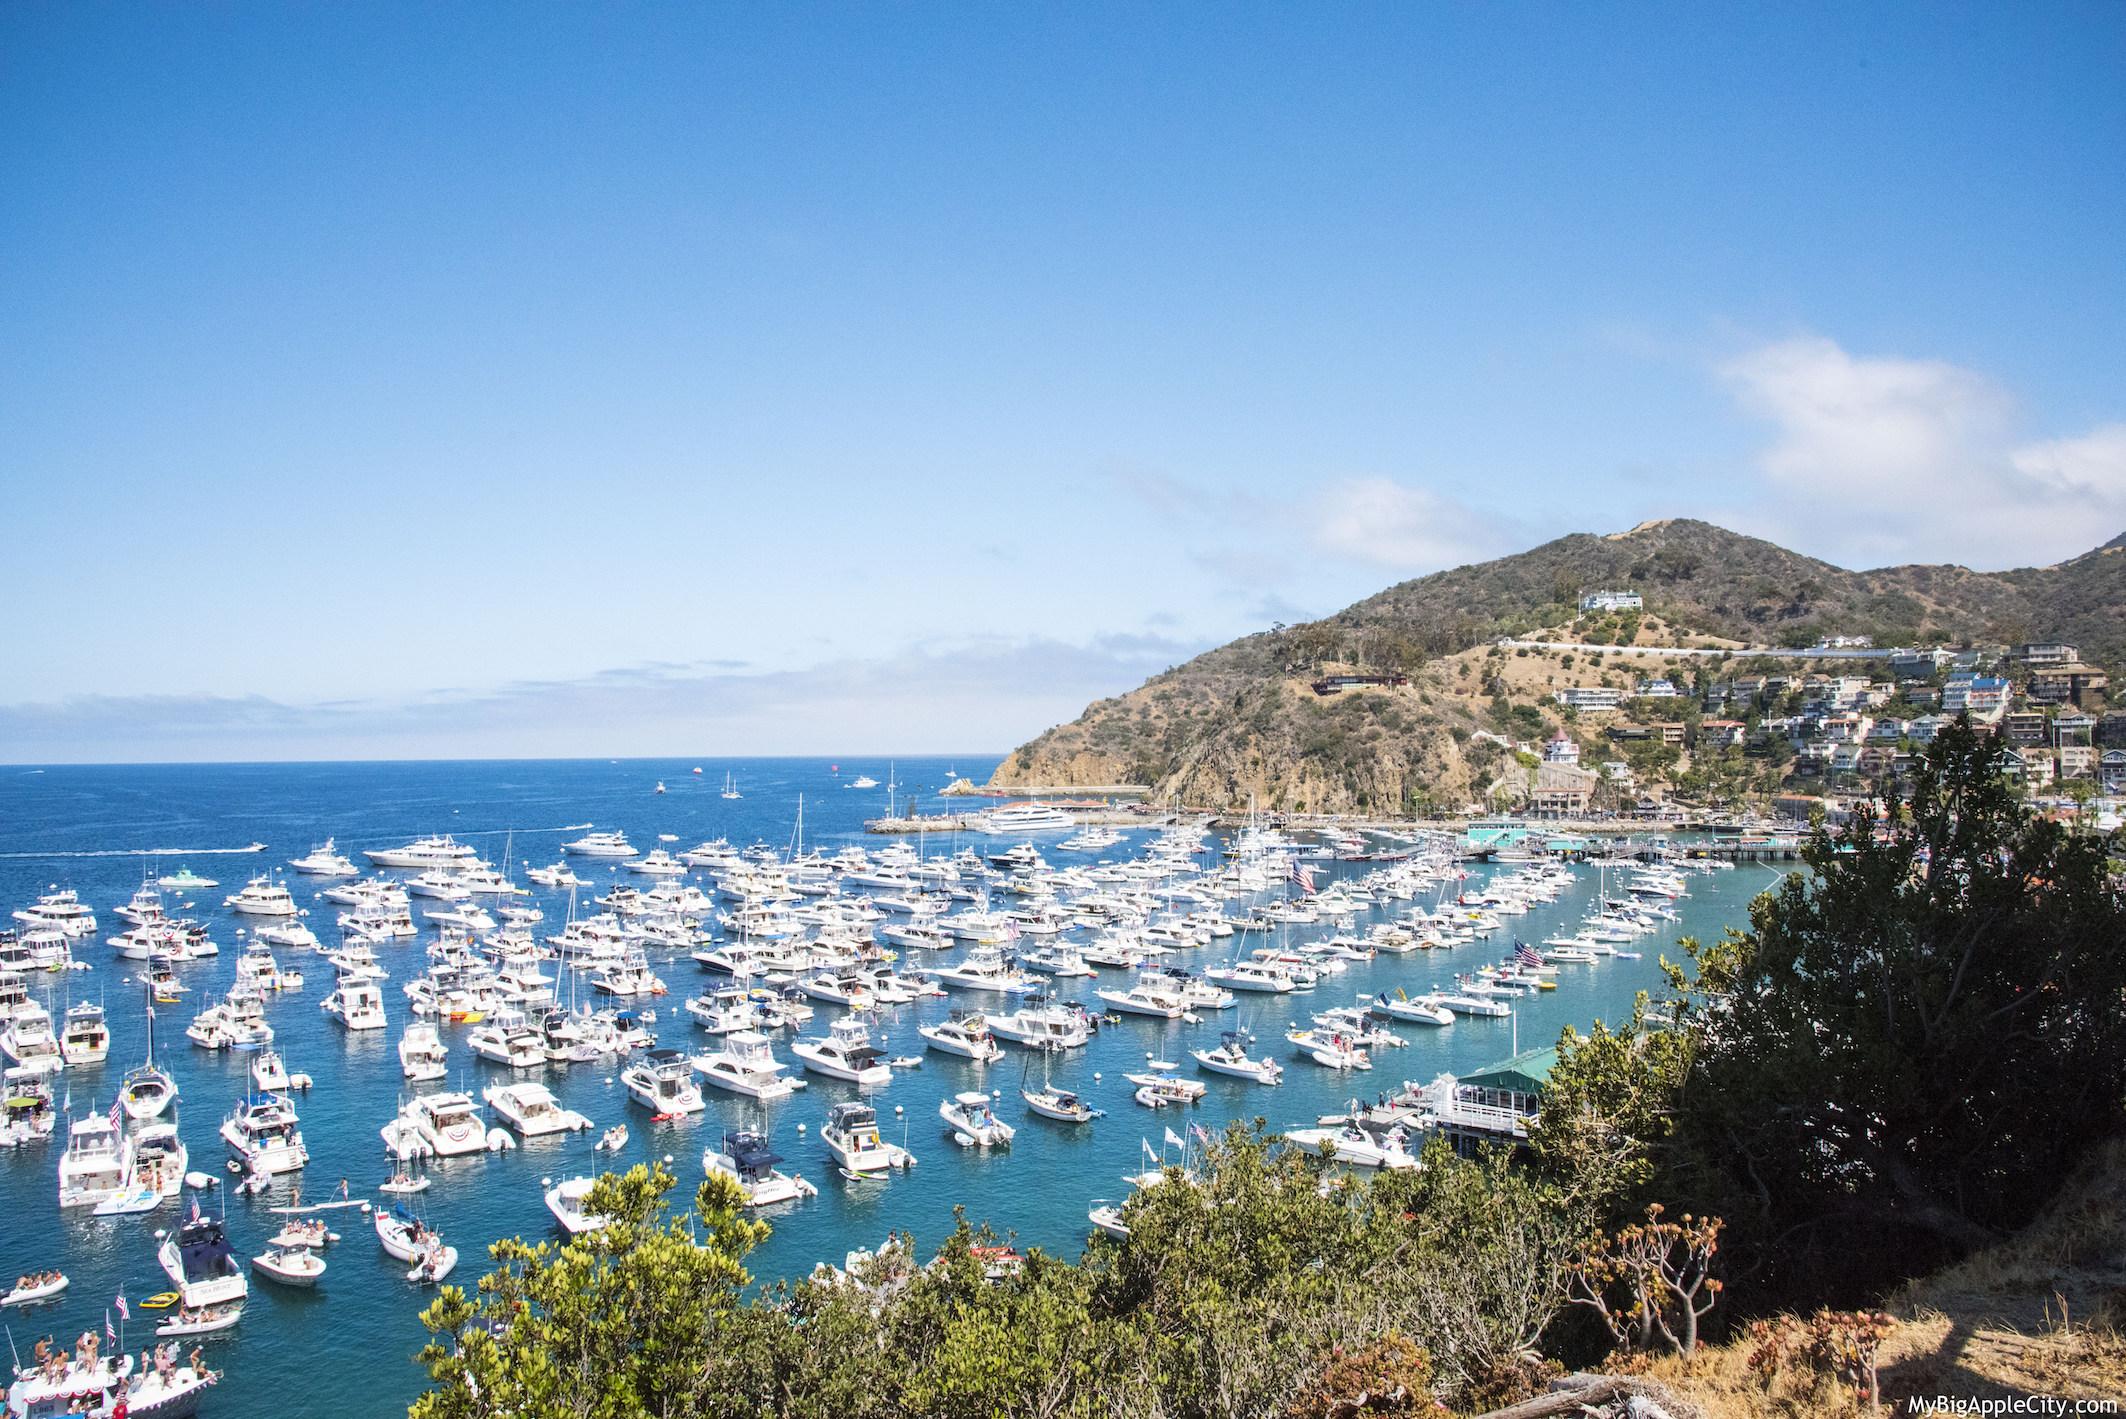 Visit-Catalina-Island-Day-trip-travelblog-summer-MyBigapplecity